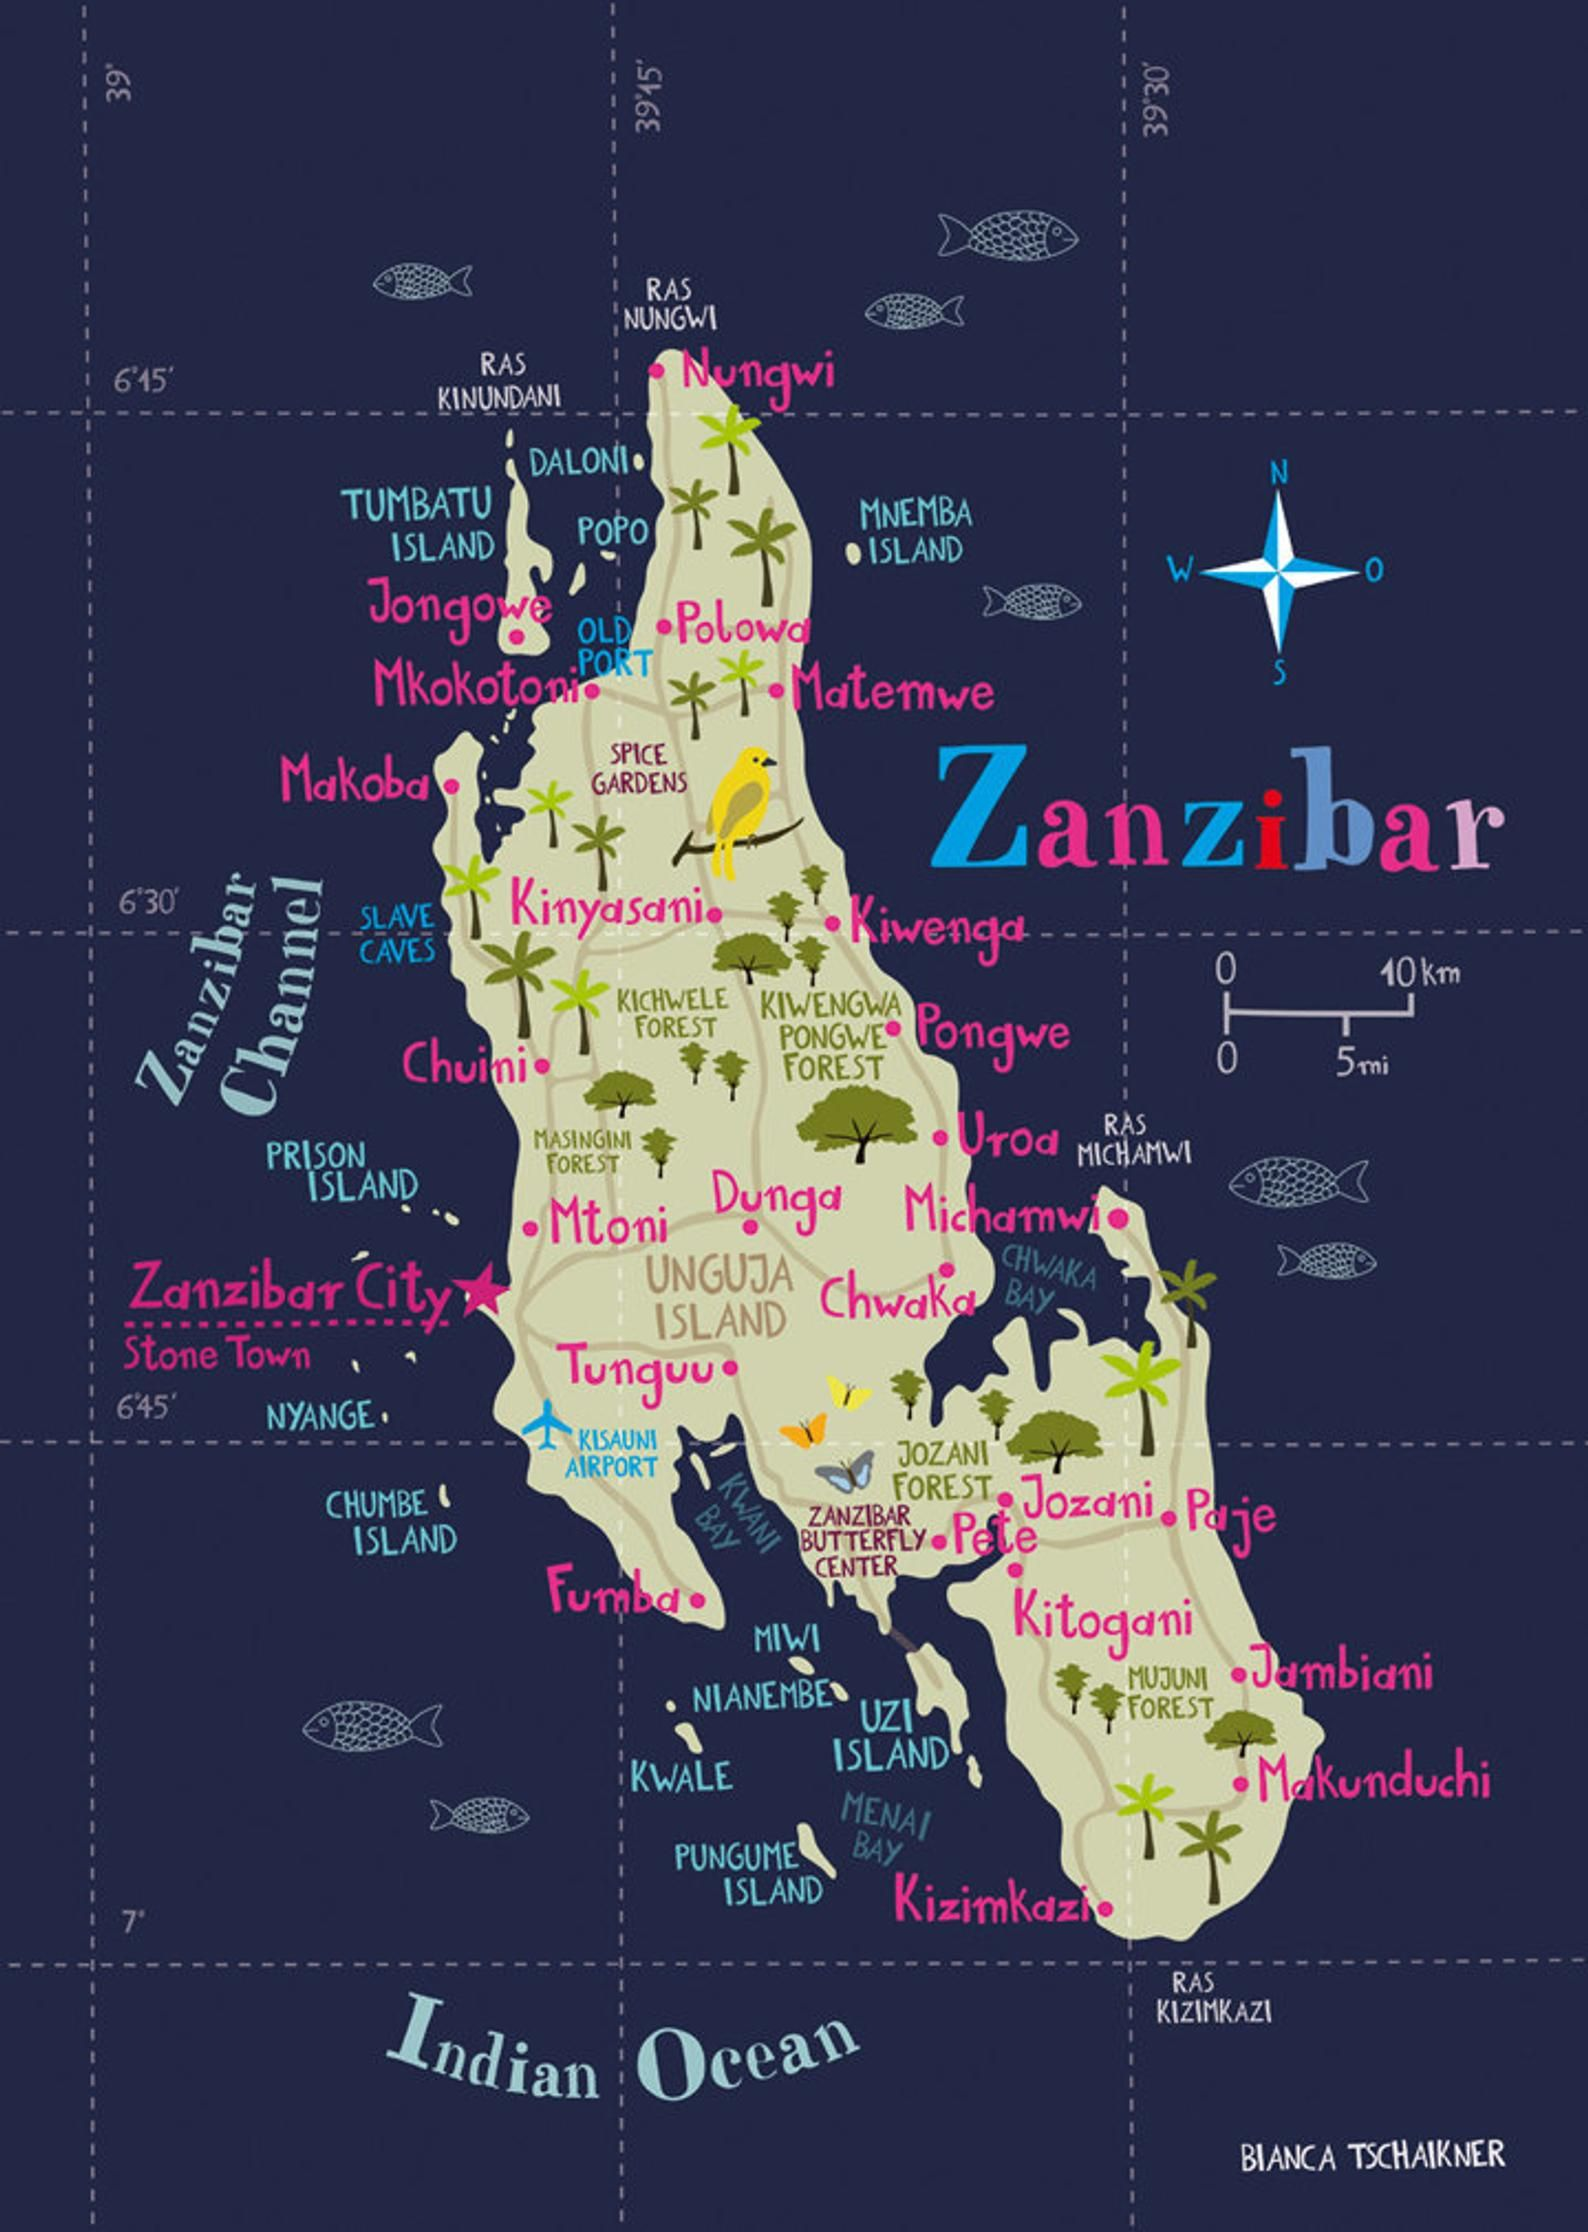 Pin On Zanzibar Travel